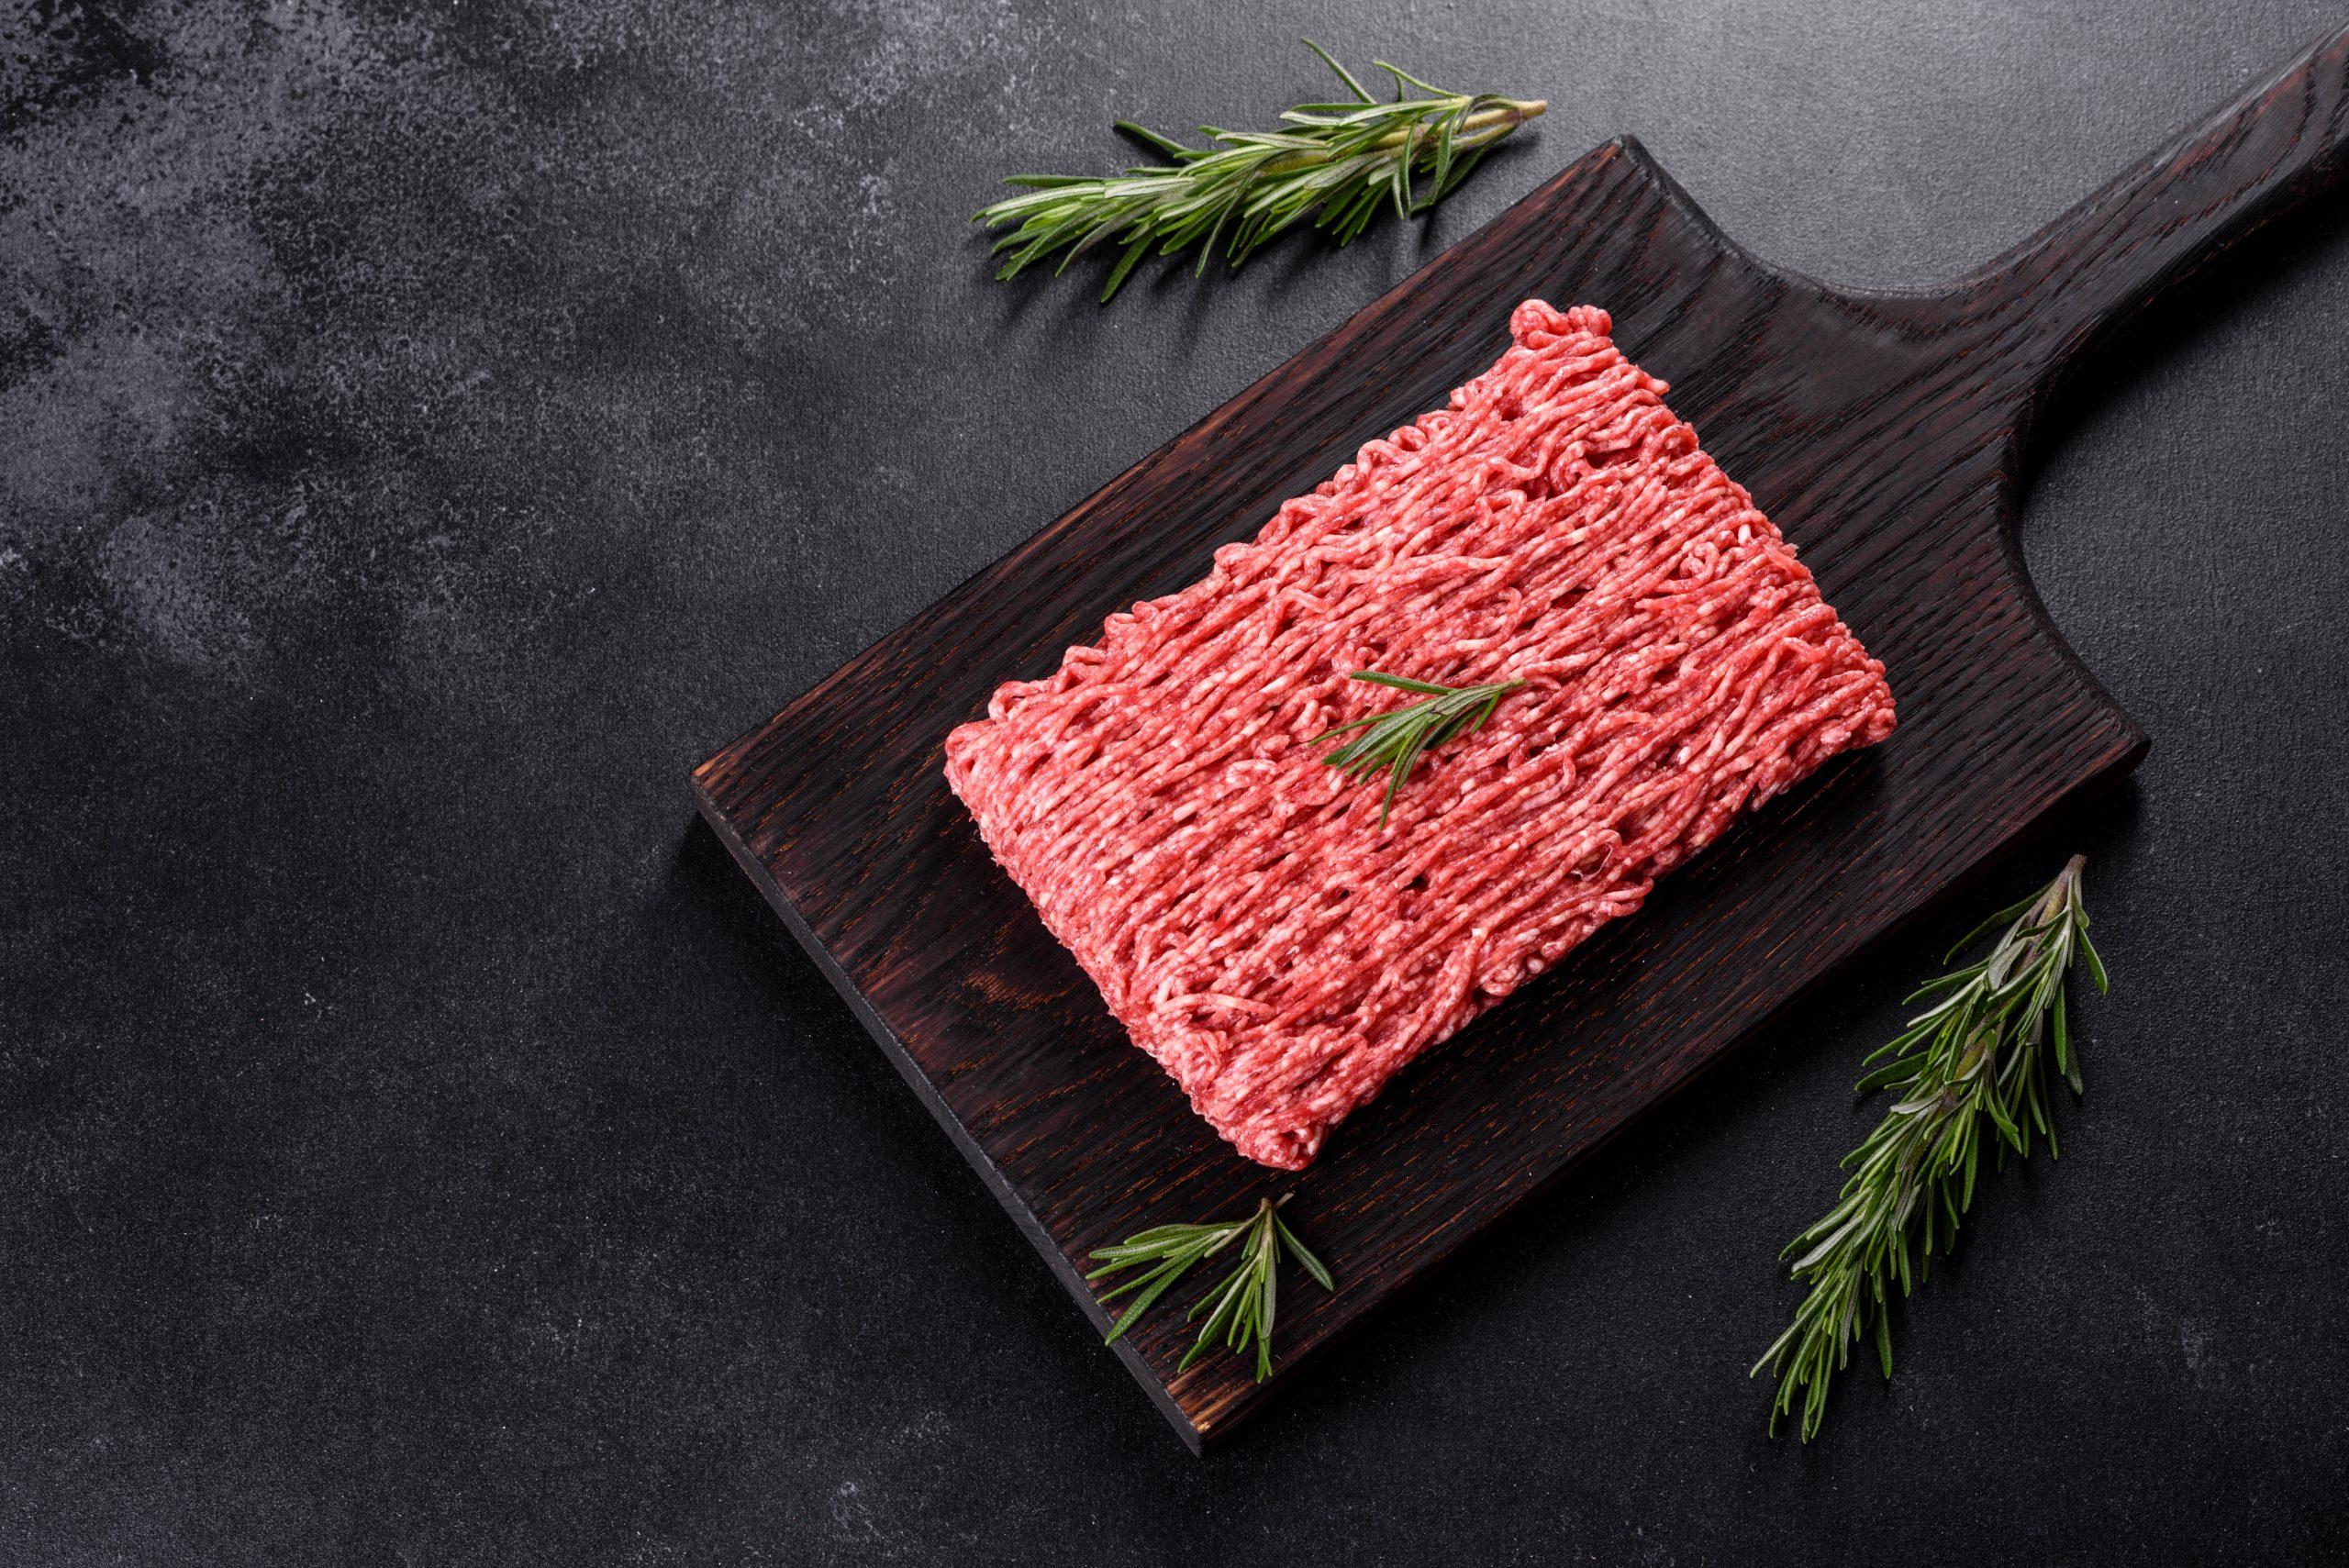 Platos sabrosos con carne picada